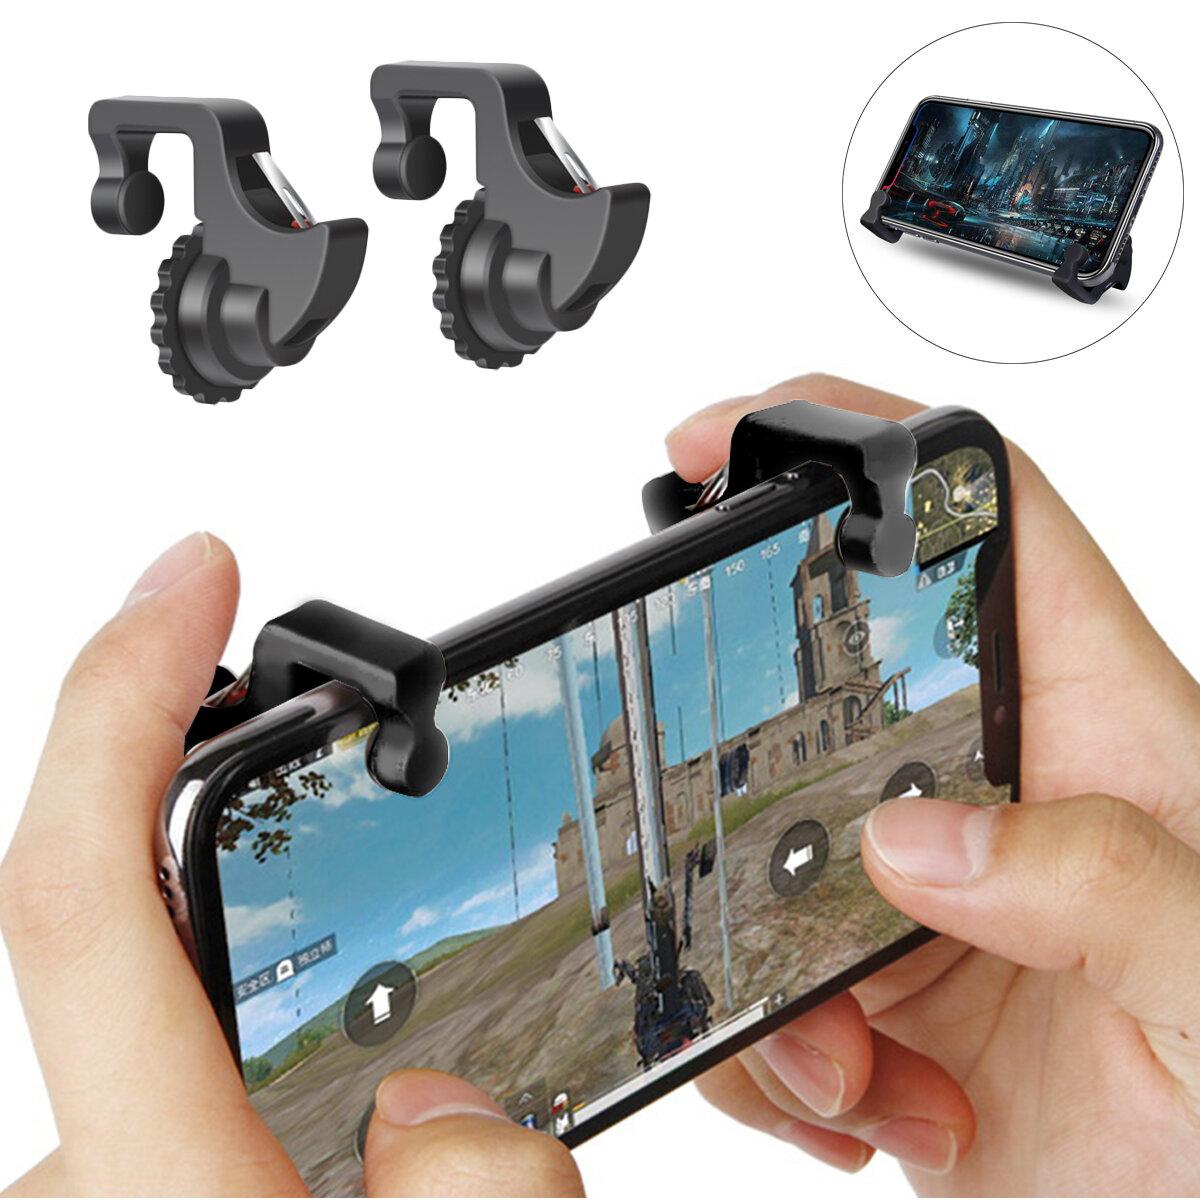 Bakeey Joystick Gamepad Controller Trigger Fire Button Assist Tool For PUBG Mobile Legends